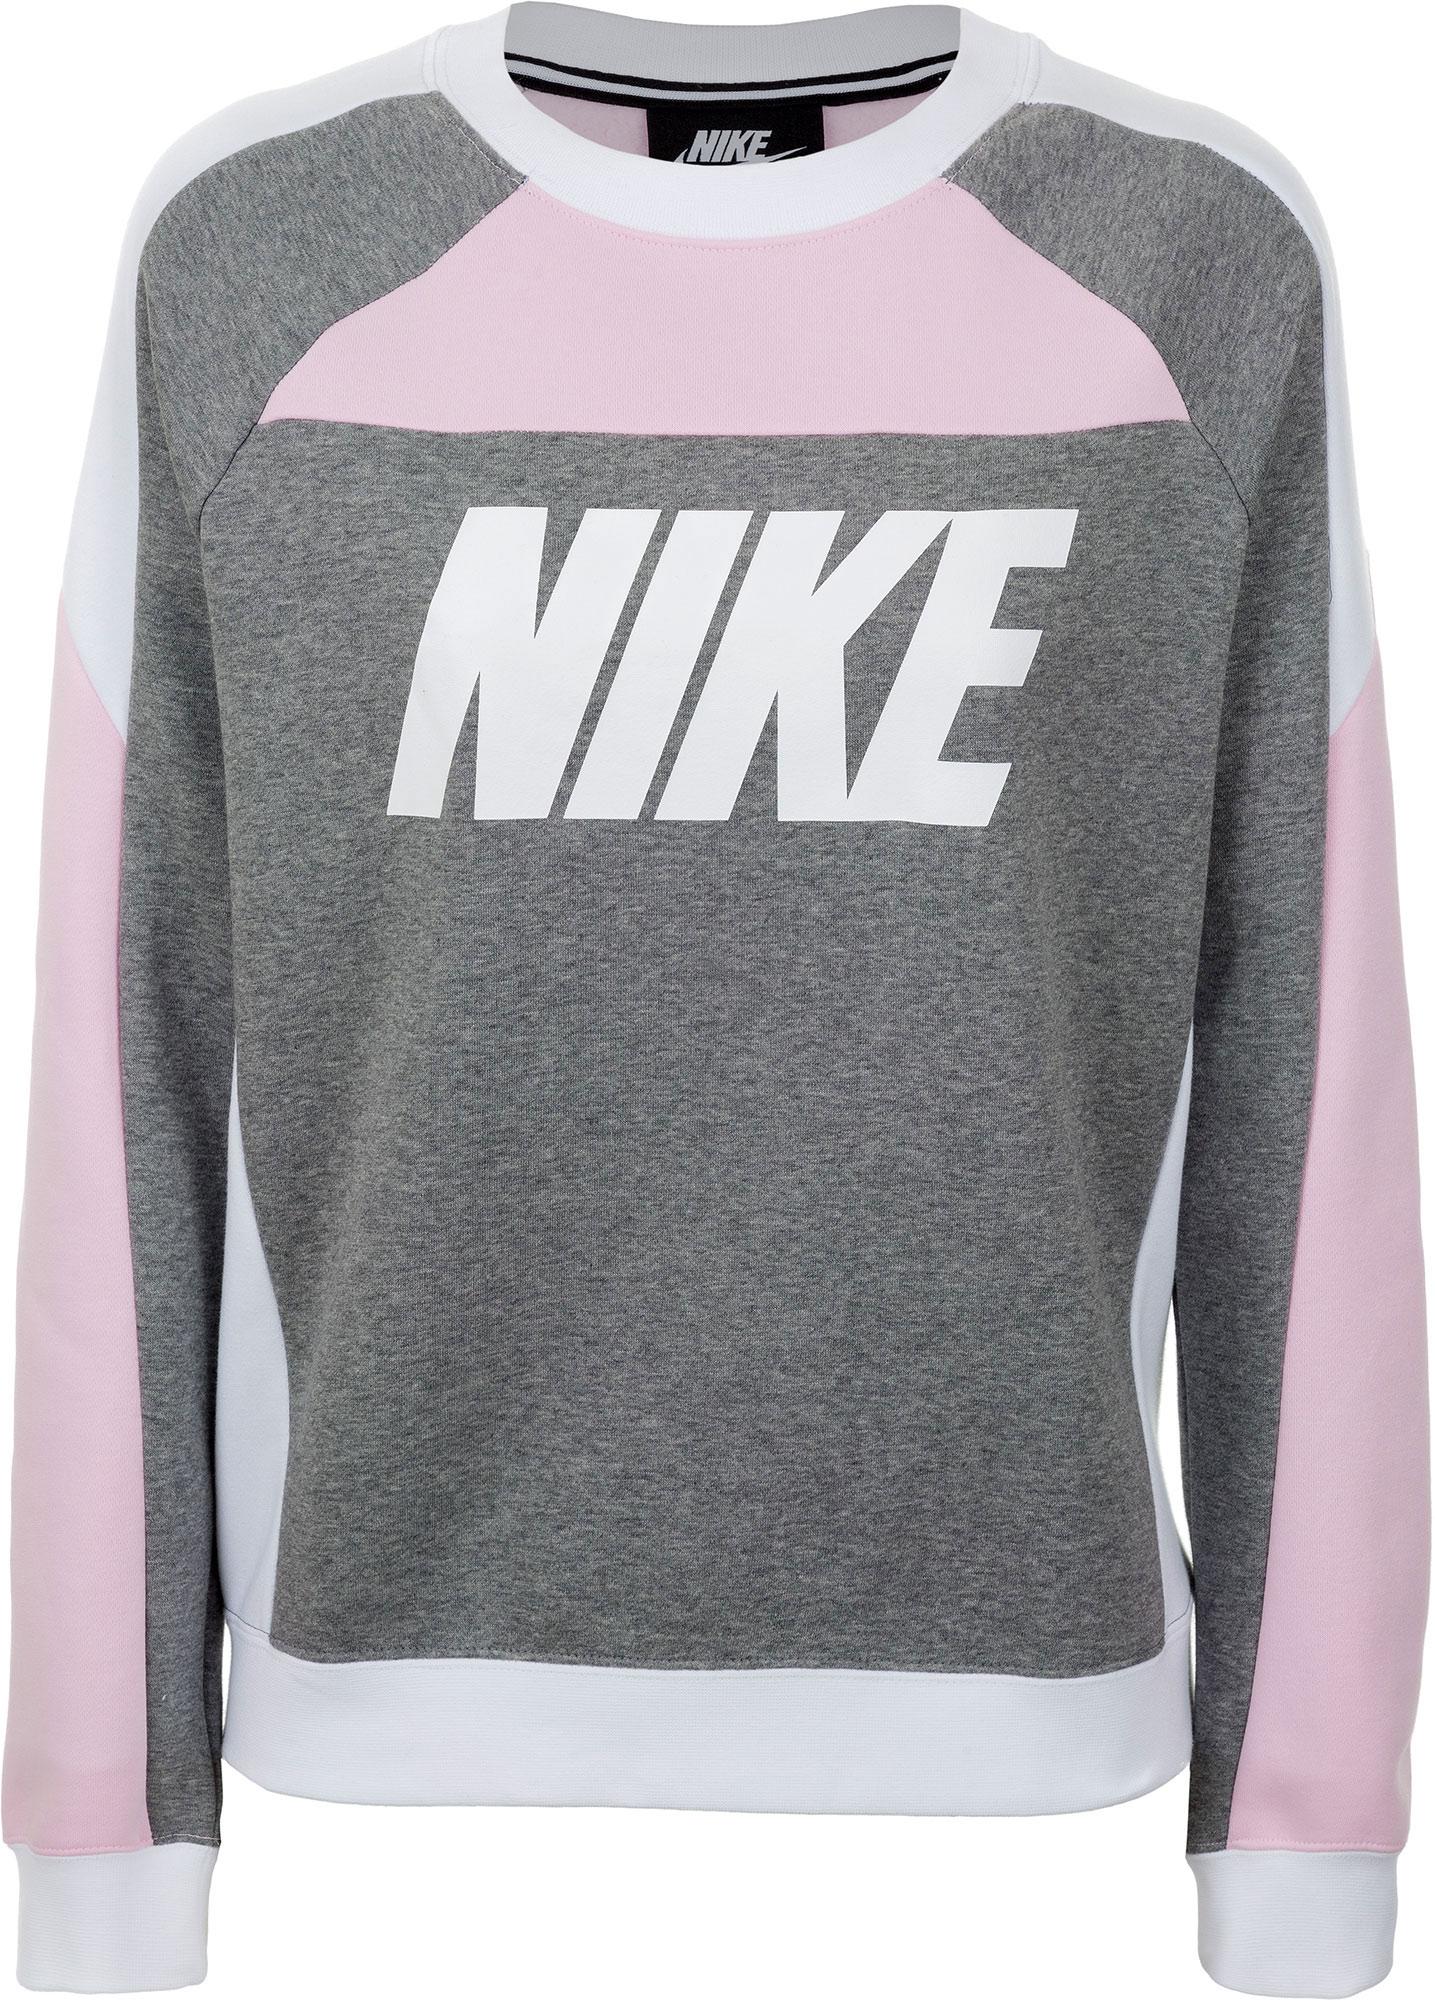 Nike Джемпер женский Nike Sportswear, размер 48-50